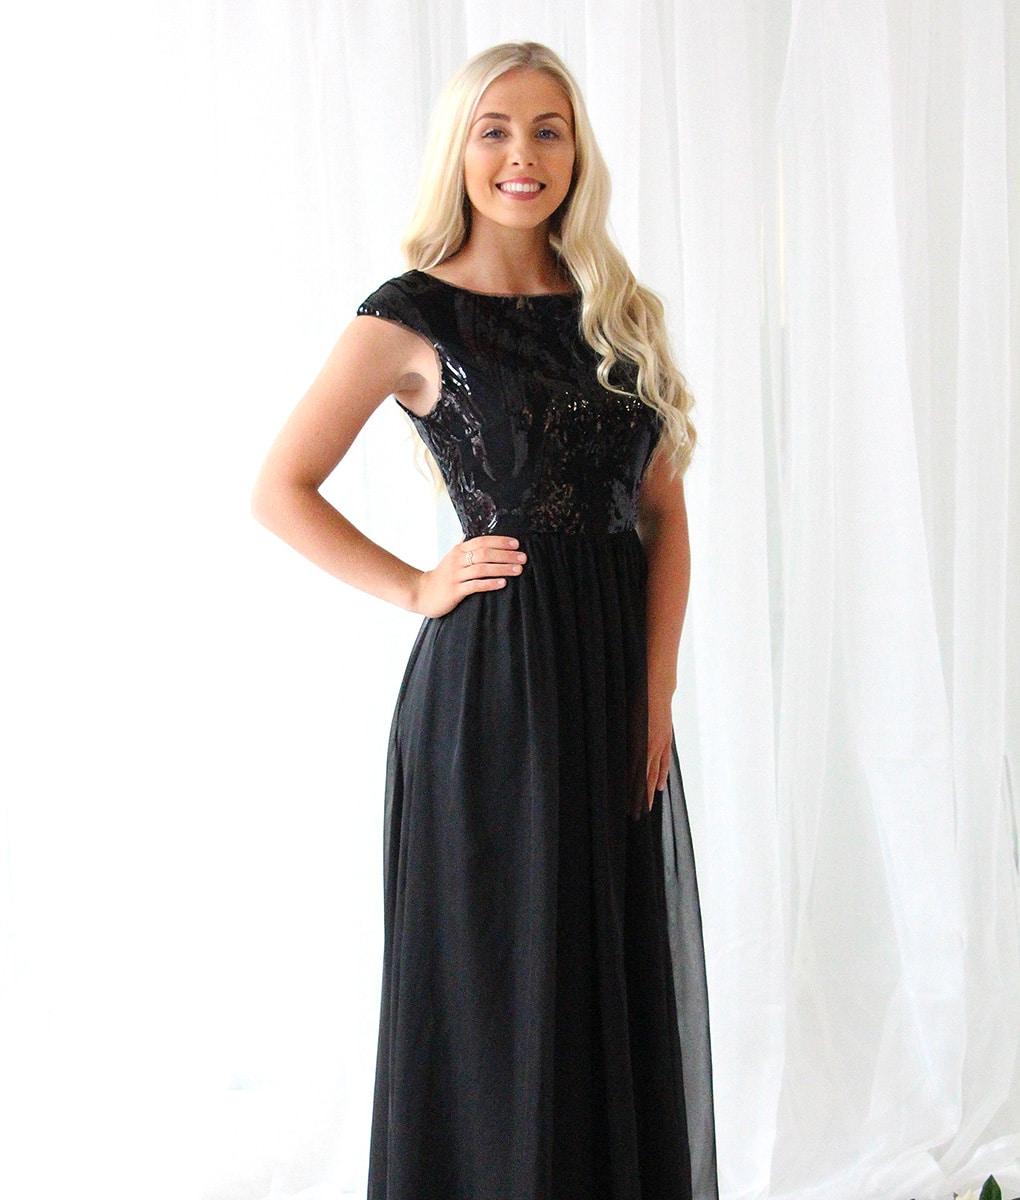 Alila-Black-Sequin-Chiffon-Debs-Dress-Bariano-gown